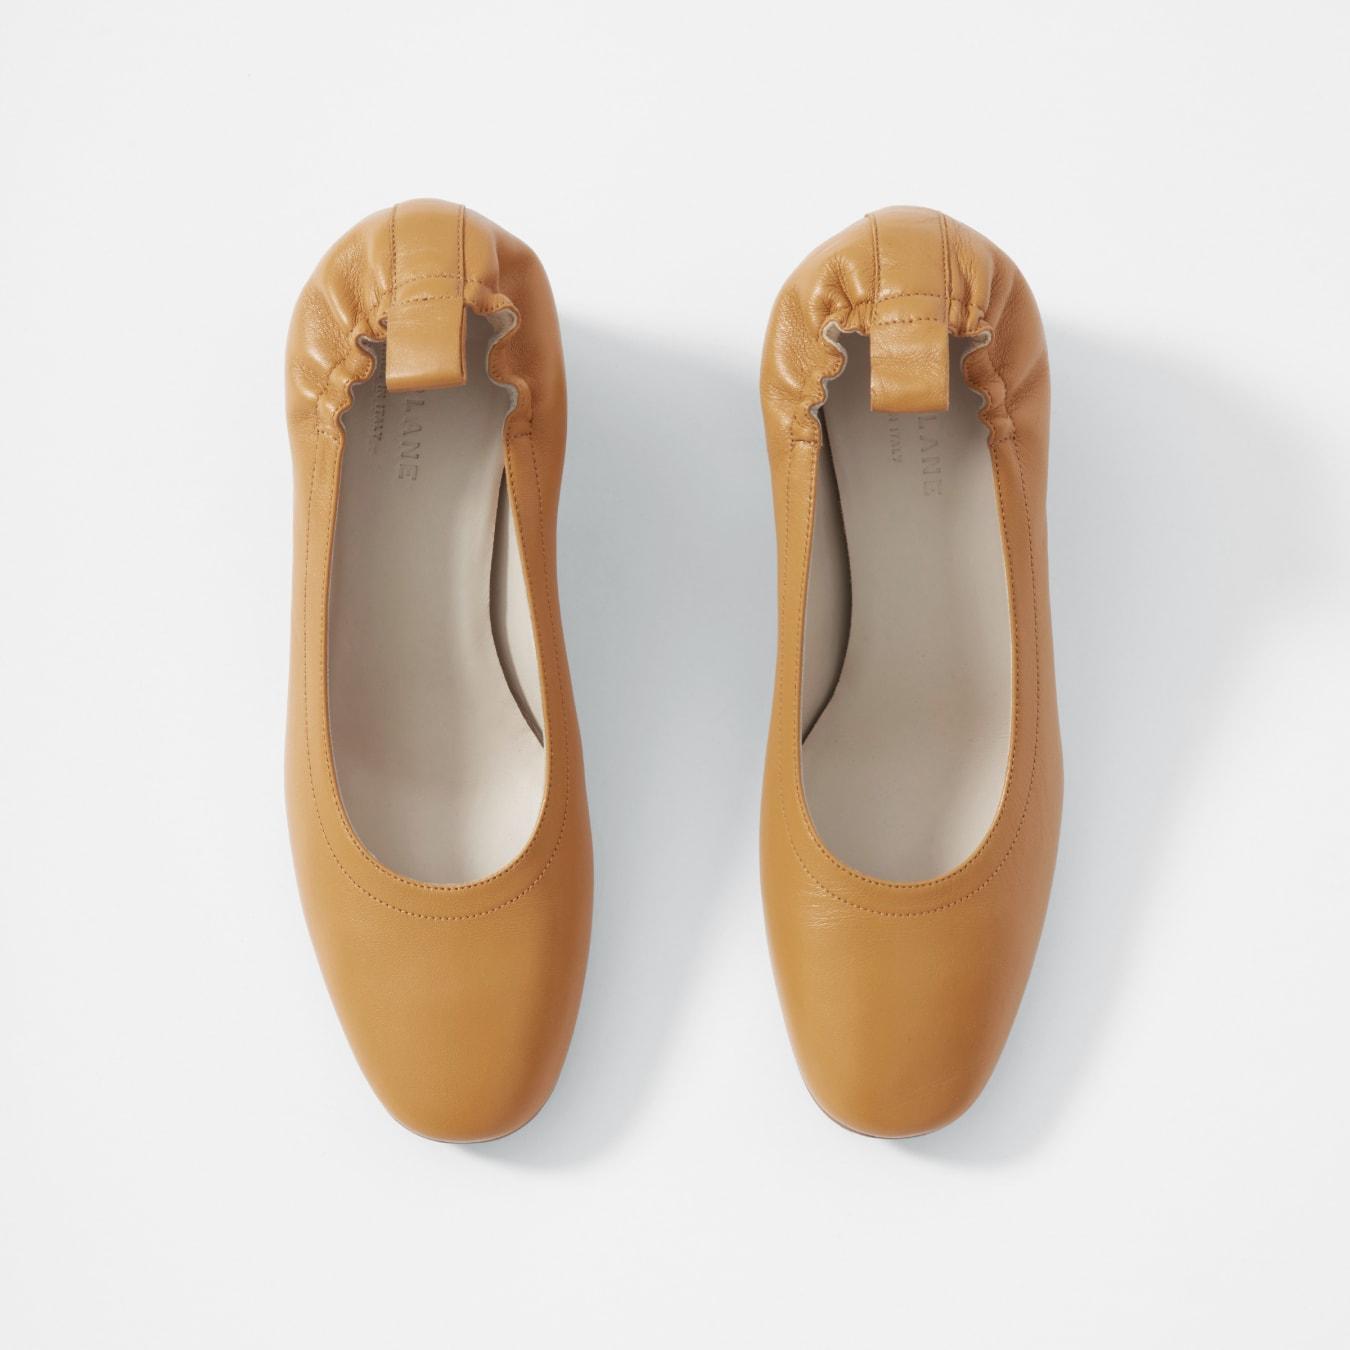 Ladies Yuu Fay Natural Tan Flats Comfort Shoes Sizes 6